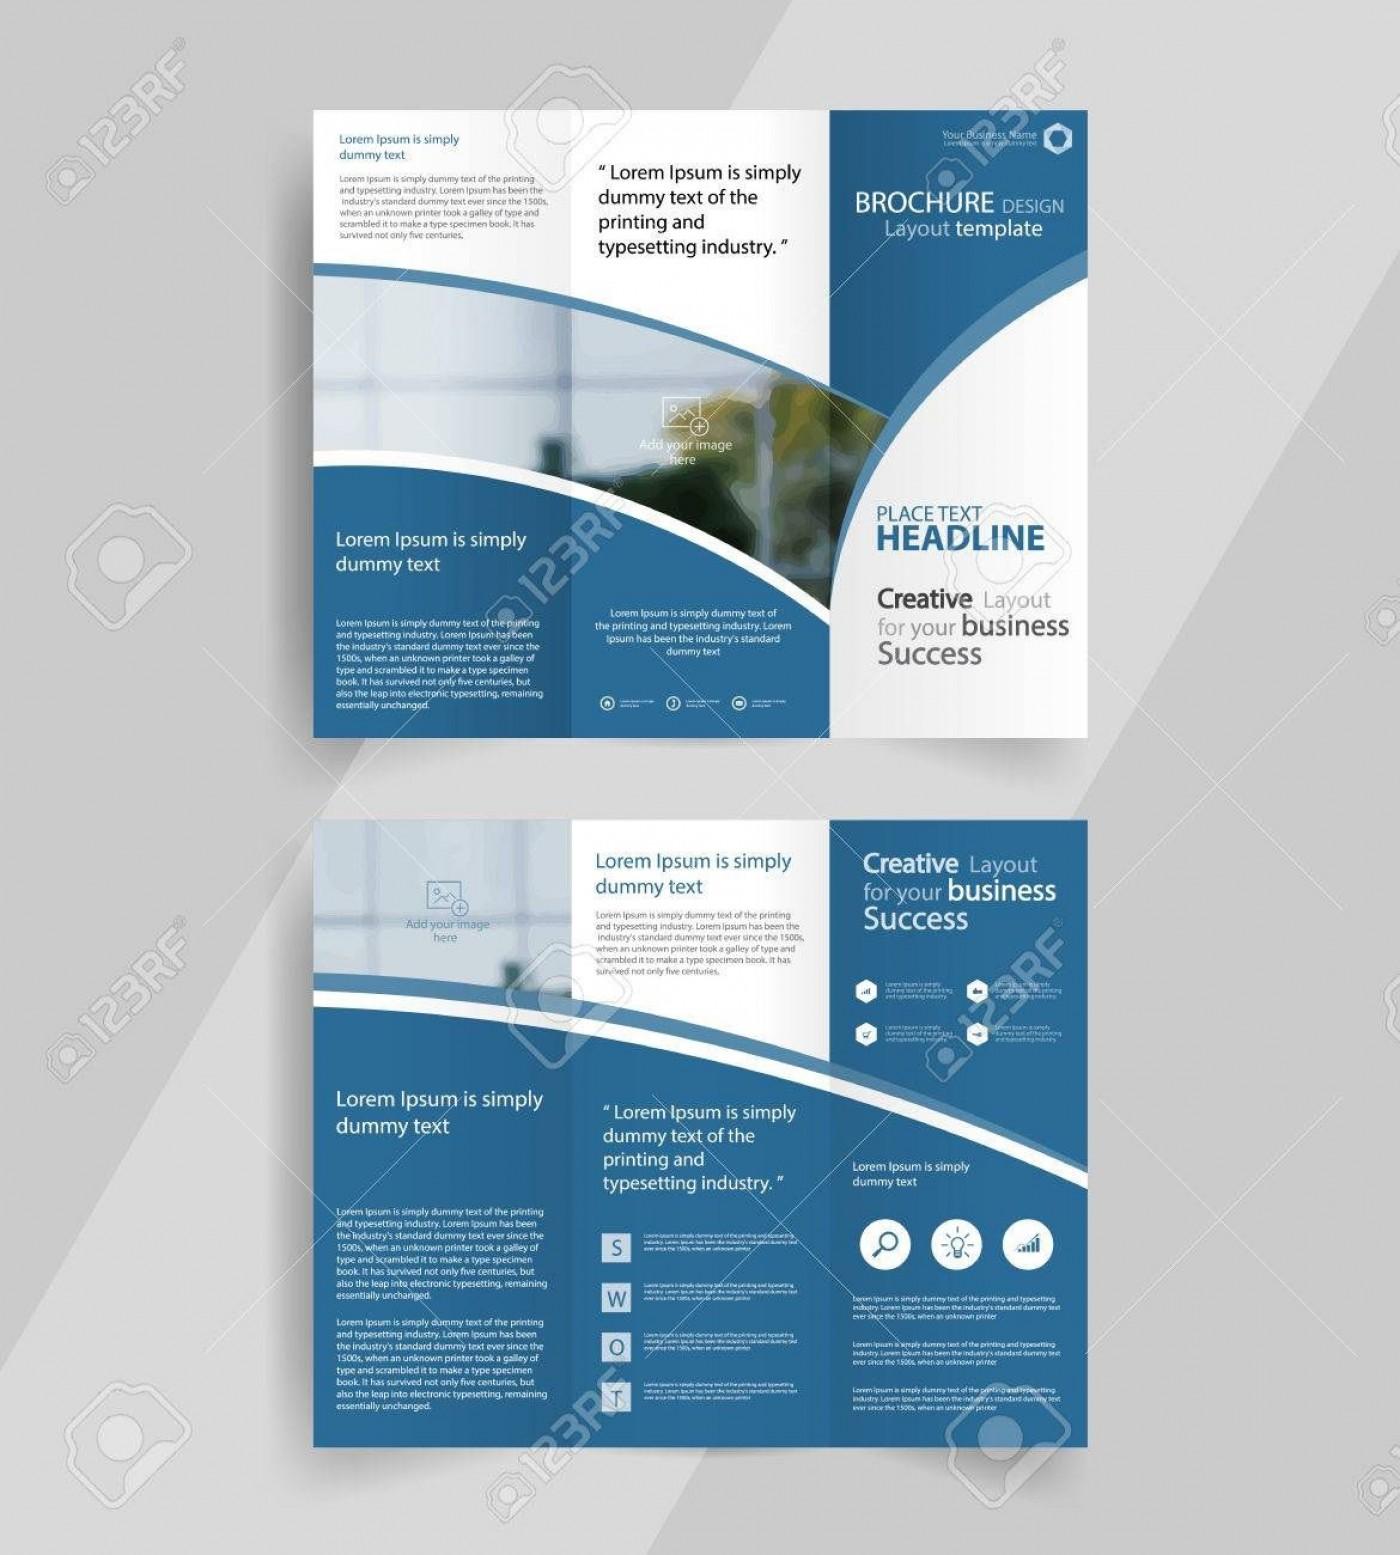 003 Impressive Tri Fold Brochure Template Free Highest Quality  Download Photoshop M Word Tri-fold Indesign Mac1400